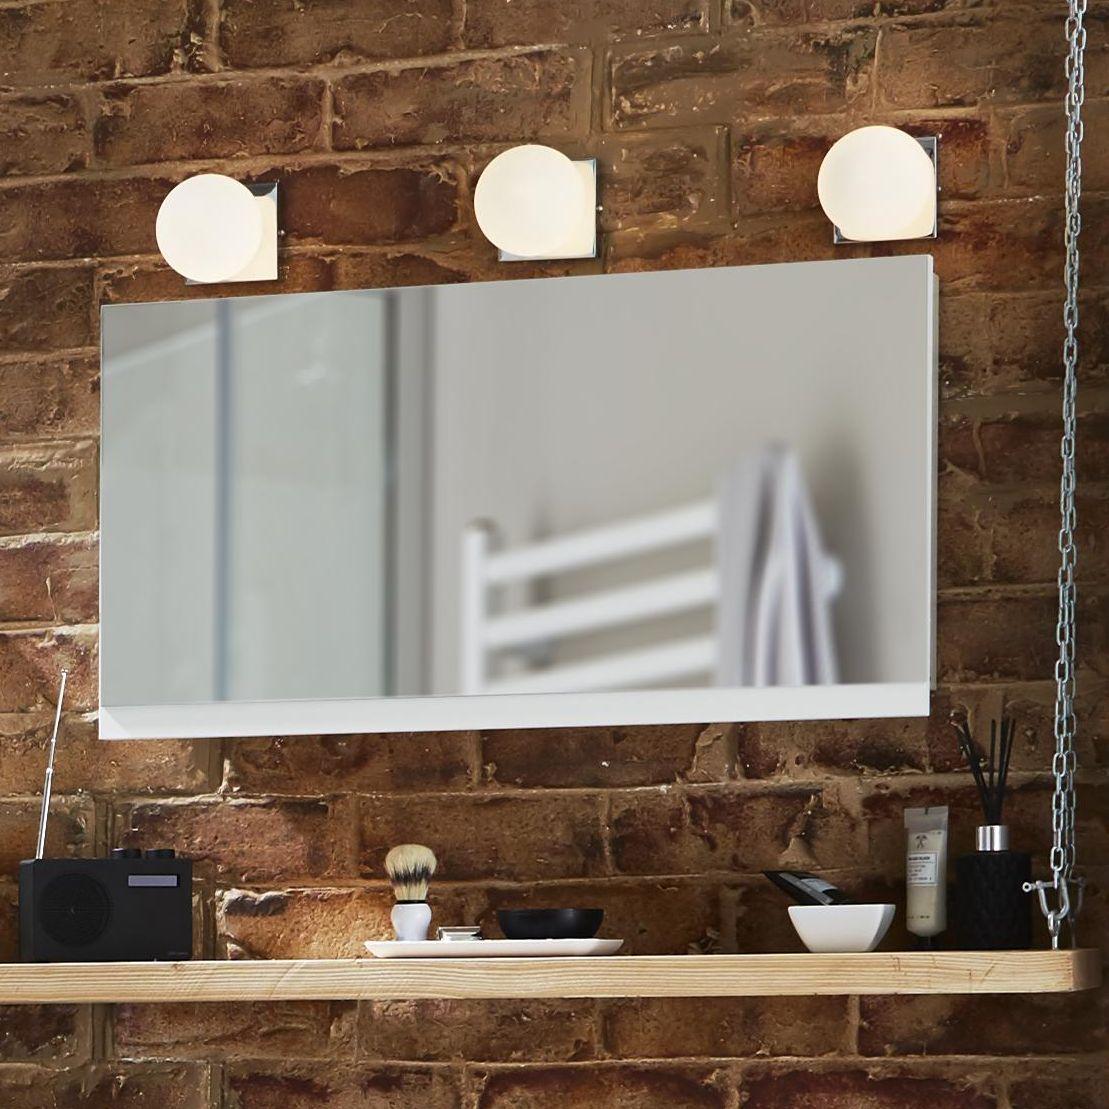 Bathroom Shaver Lights B&Q indoor lighting | lamp shades & lights